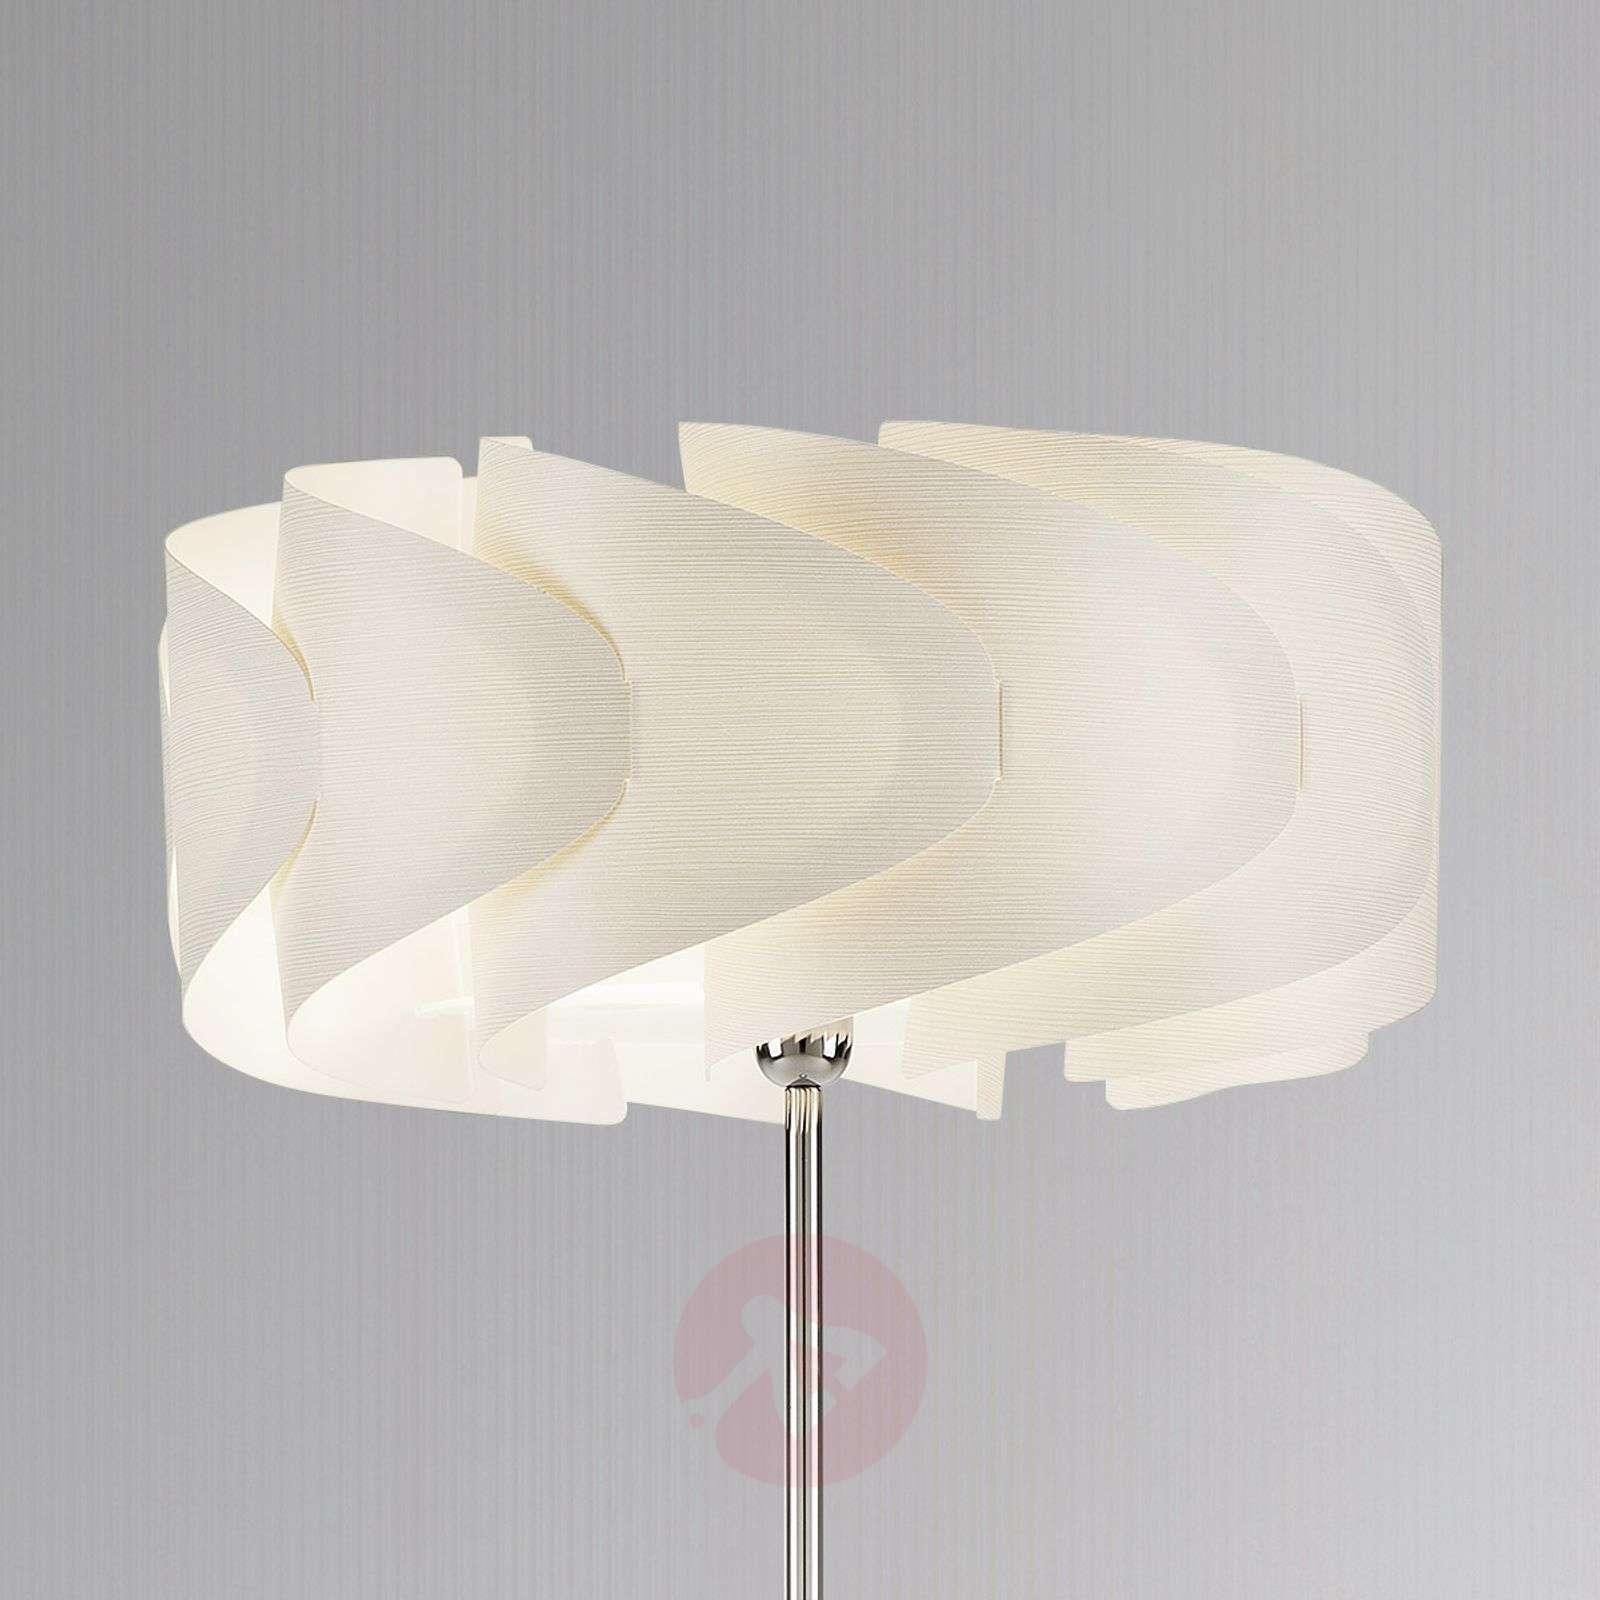 Floor lamp Piantana Ellix in white wood finish-1056077-01